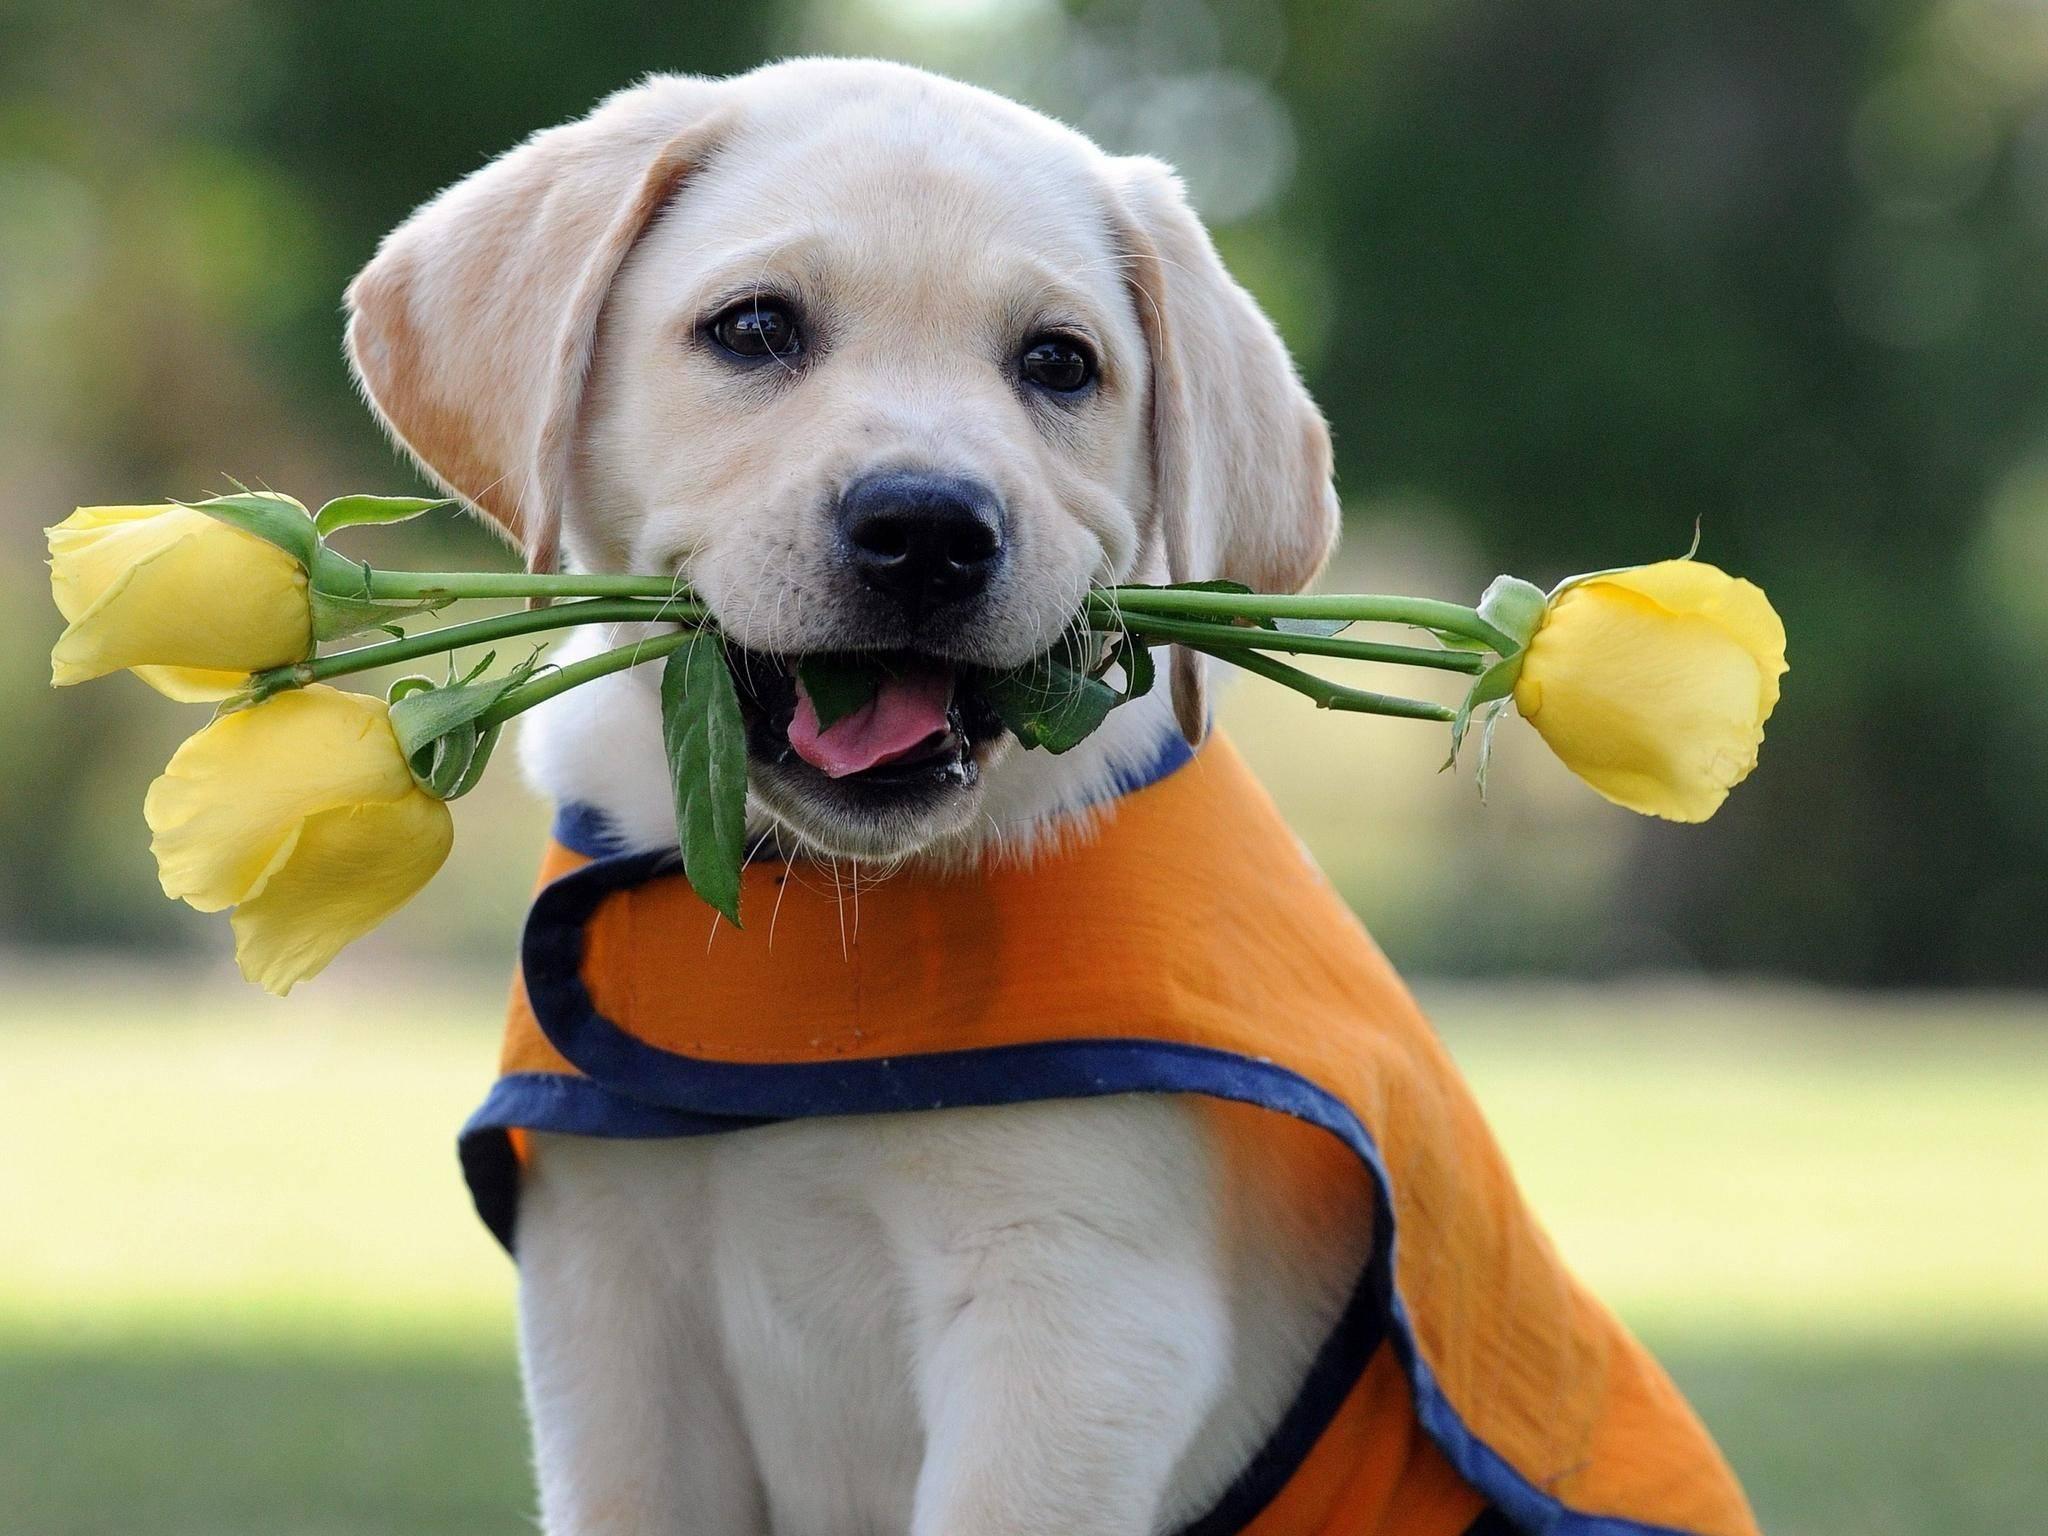 Desktop images of little cute dogs wallpaper